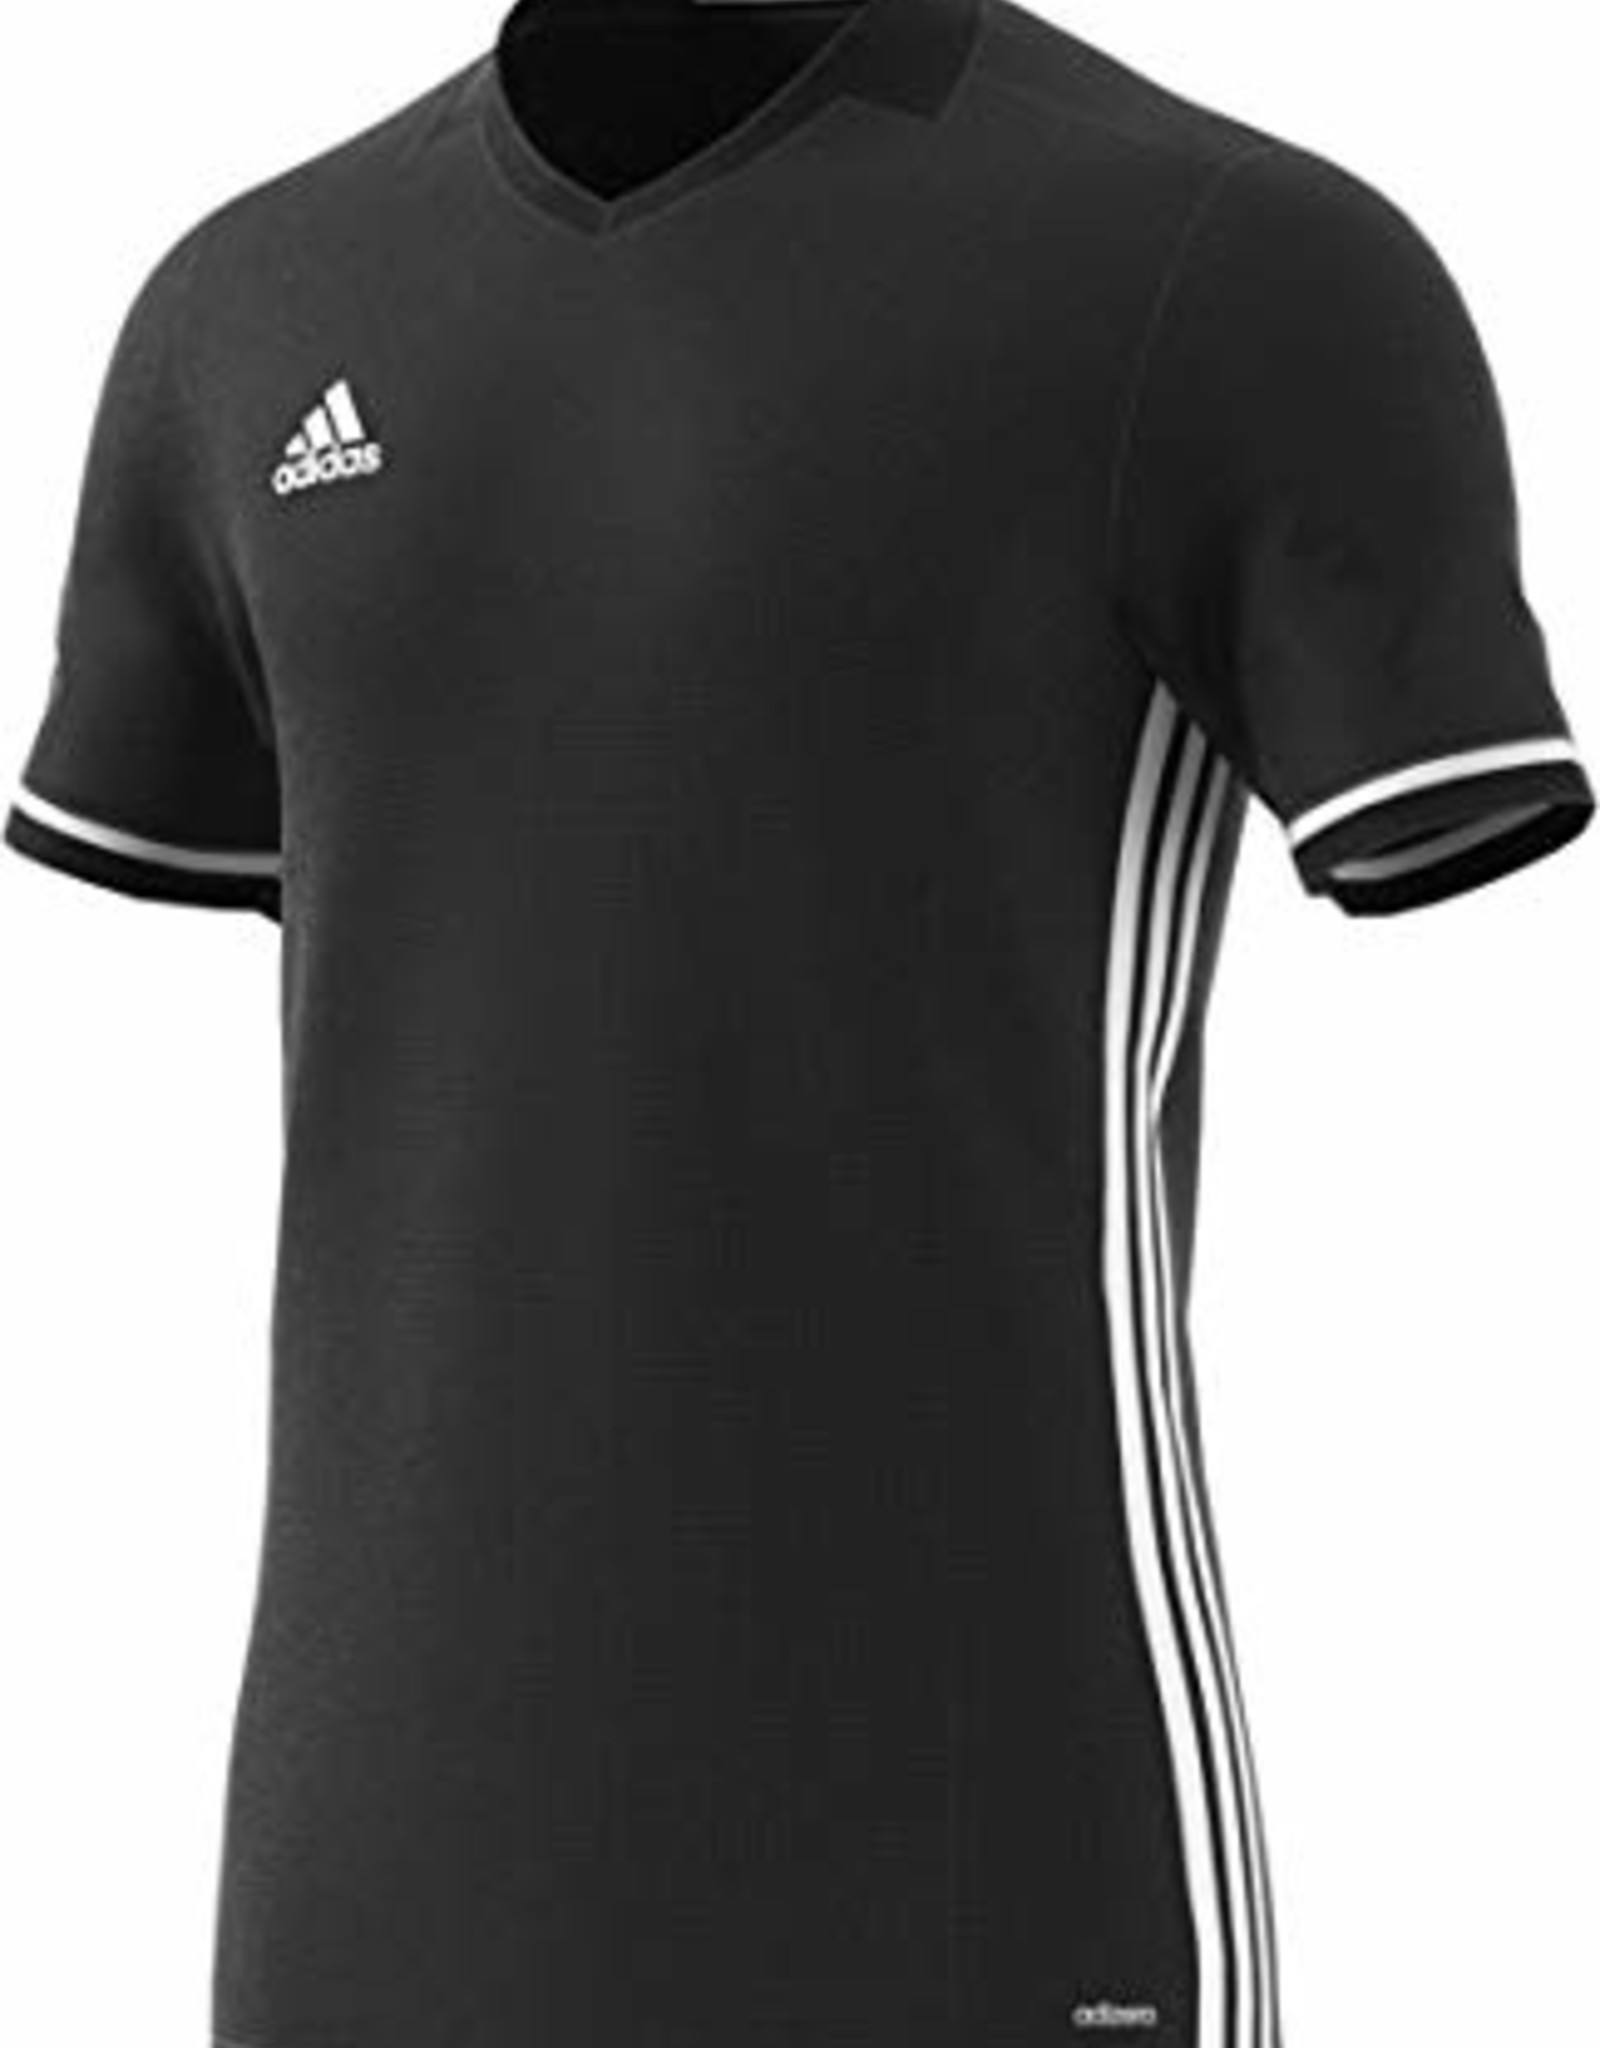 Adidas Adidas Condivo 16 Jersey